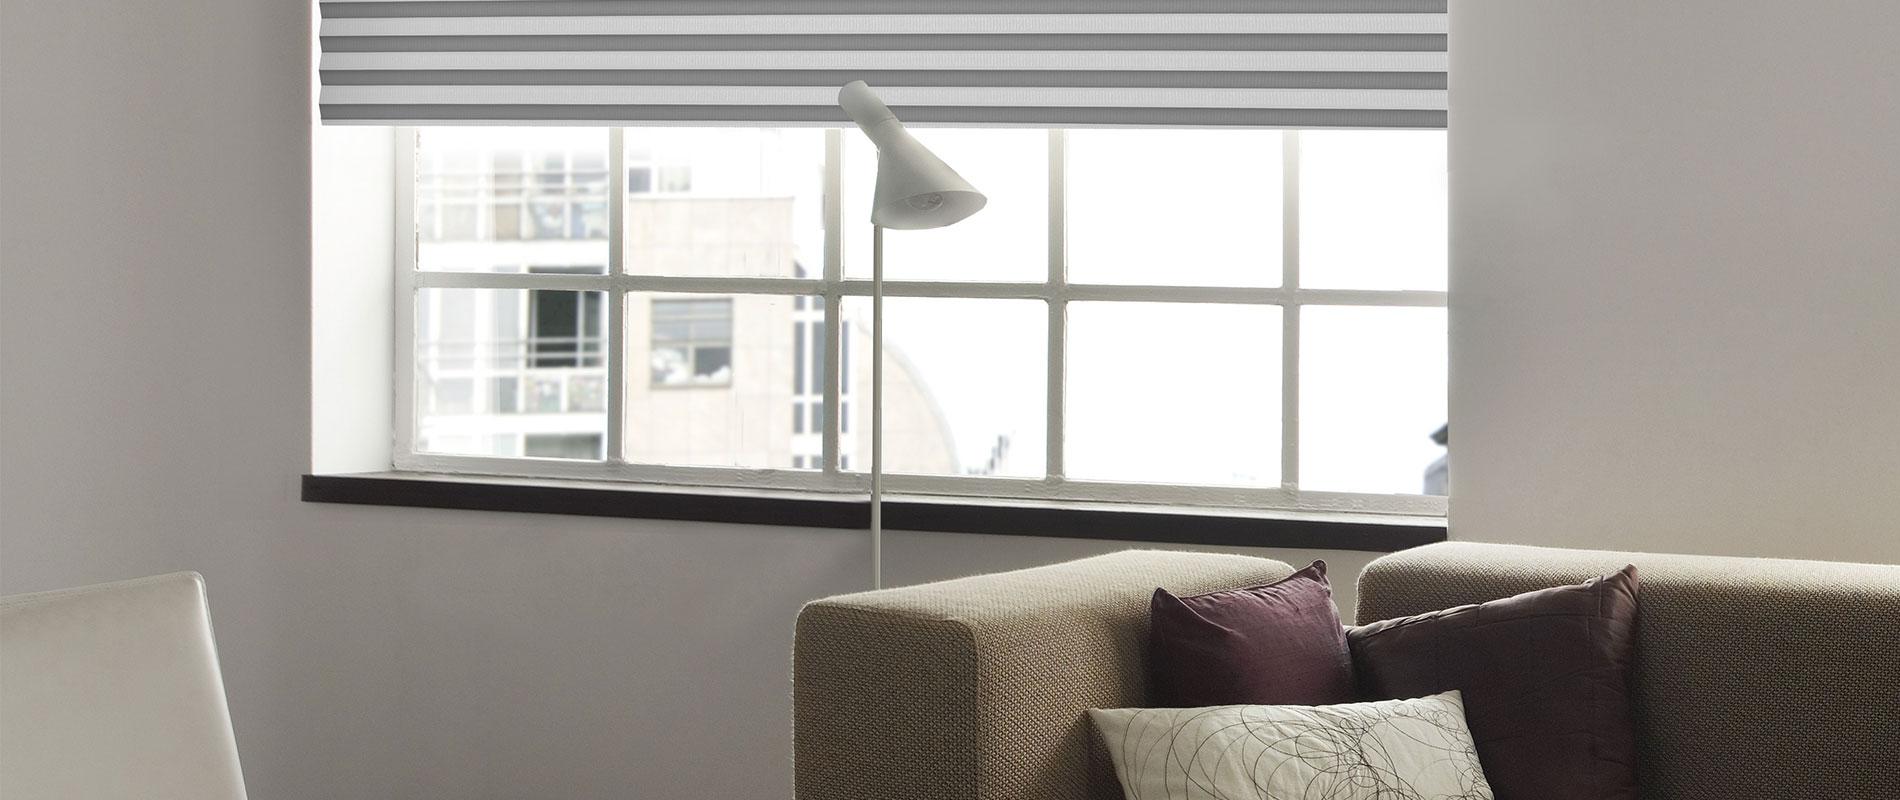 plissees blickdicht cool lichtblick klemmfix plissee ohne bohren blickdicht with plissees. Black Bedroom Furniture Sets. Home Design Ideas